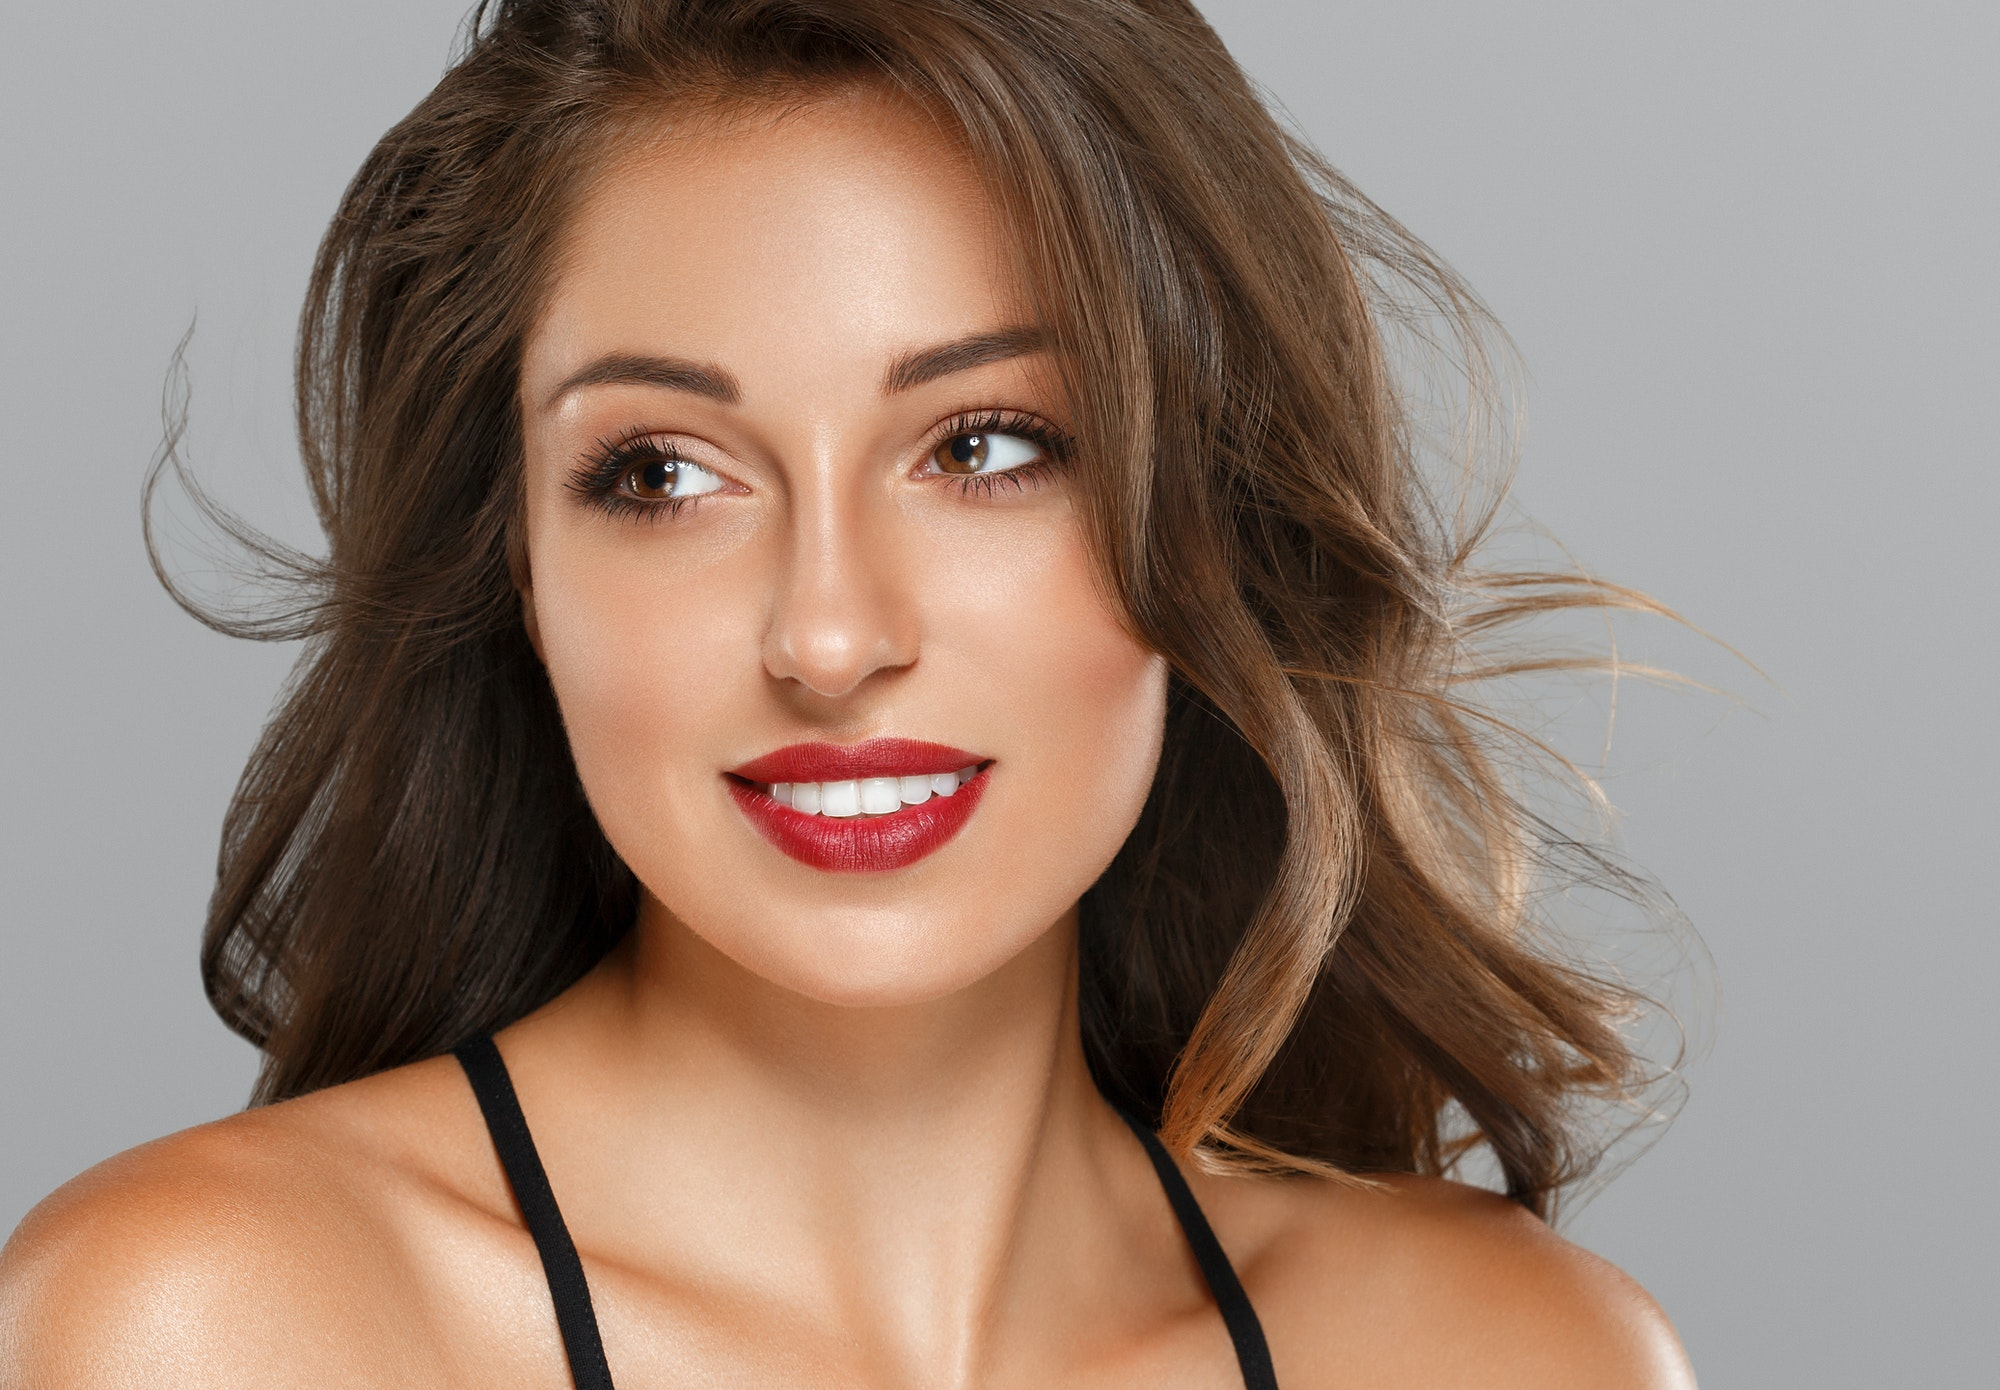 Woman portrait beautiful young female model face